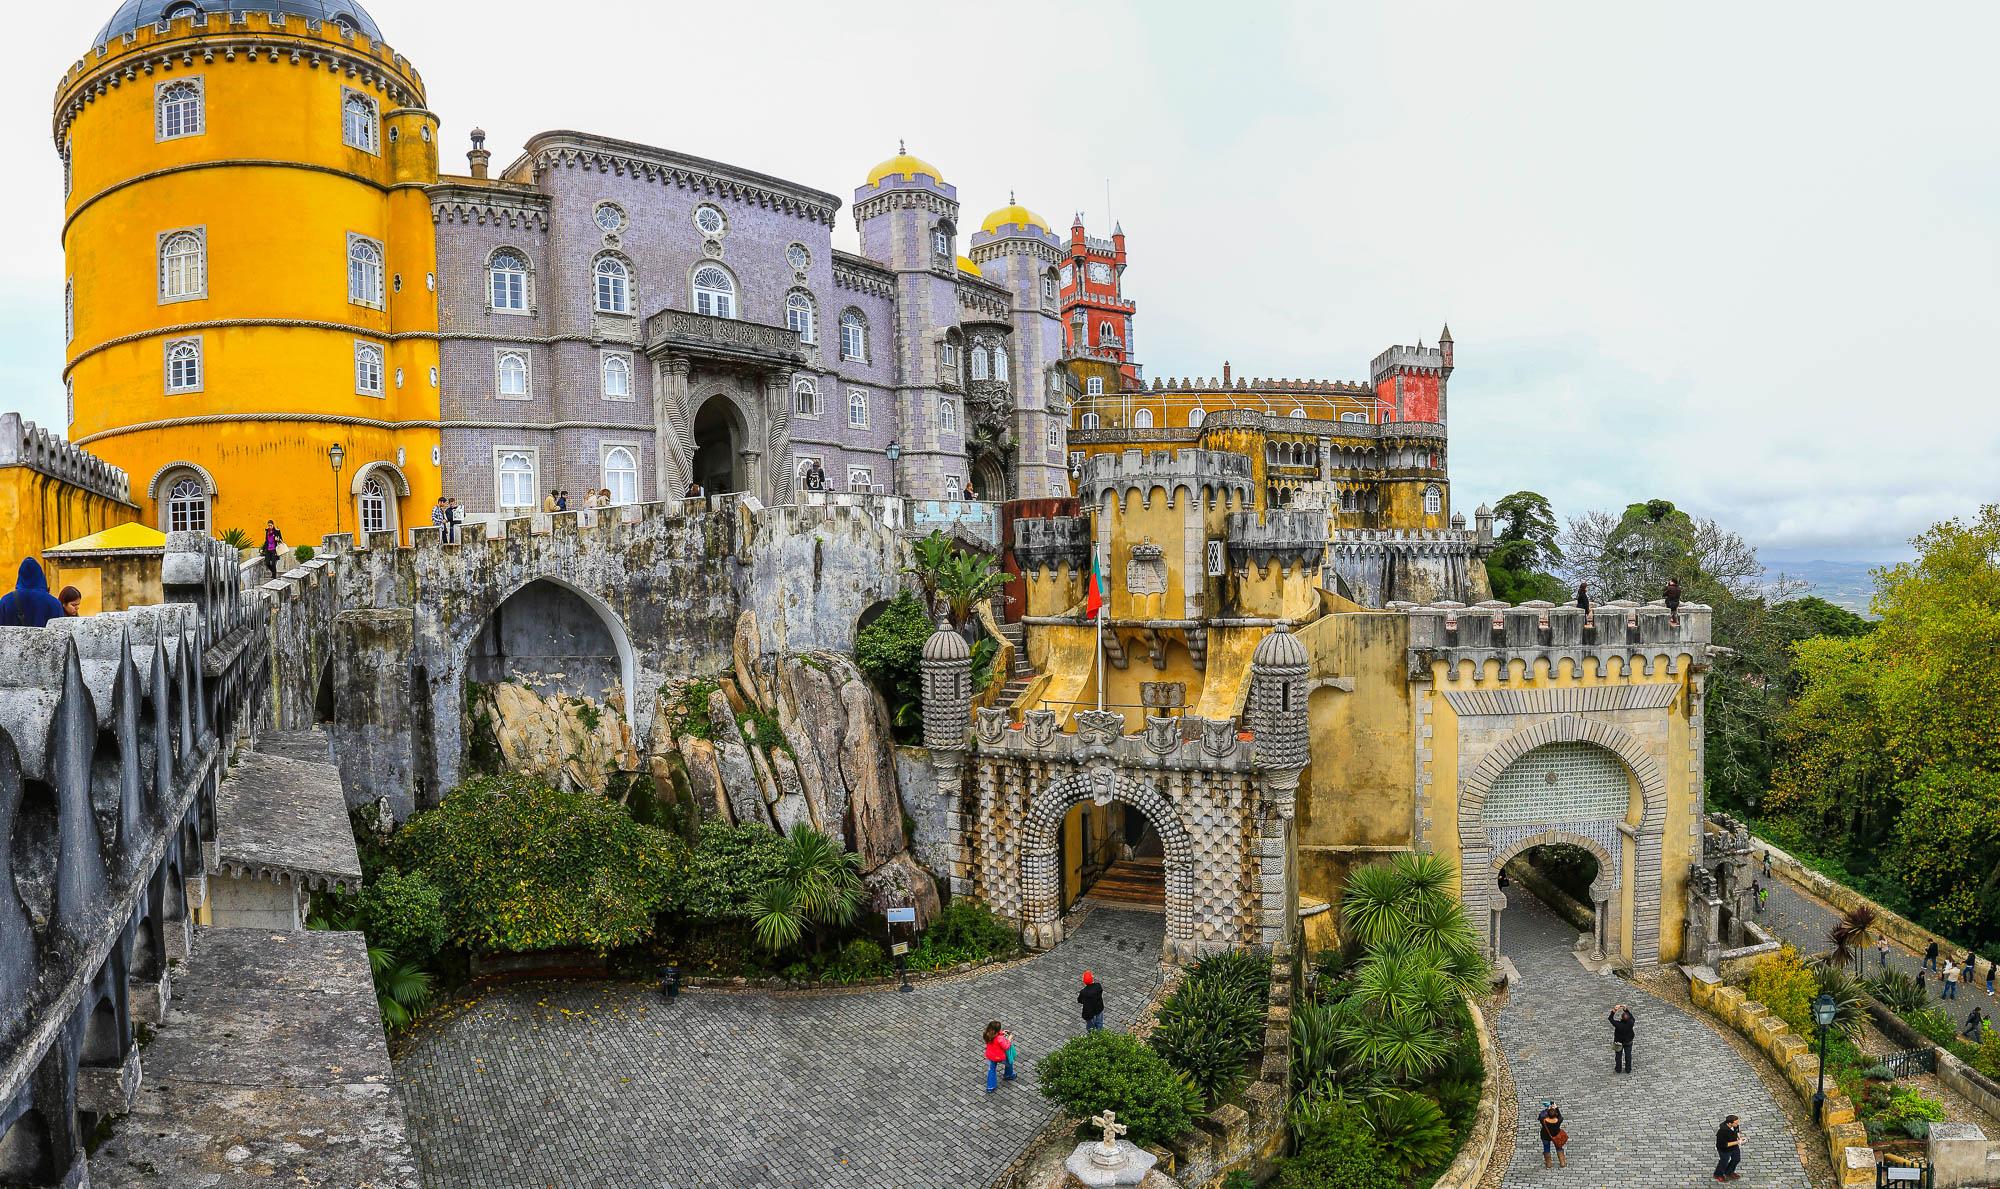 PORTUGAL-2012-jusmedic-#603-Pano